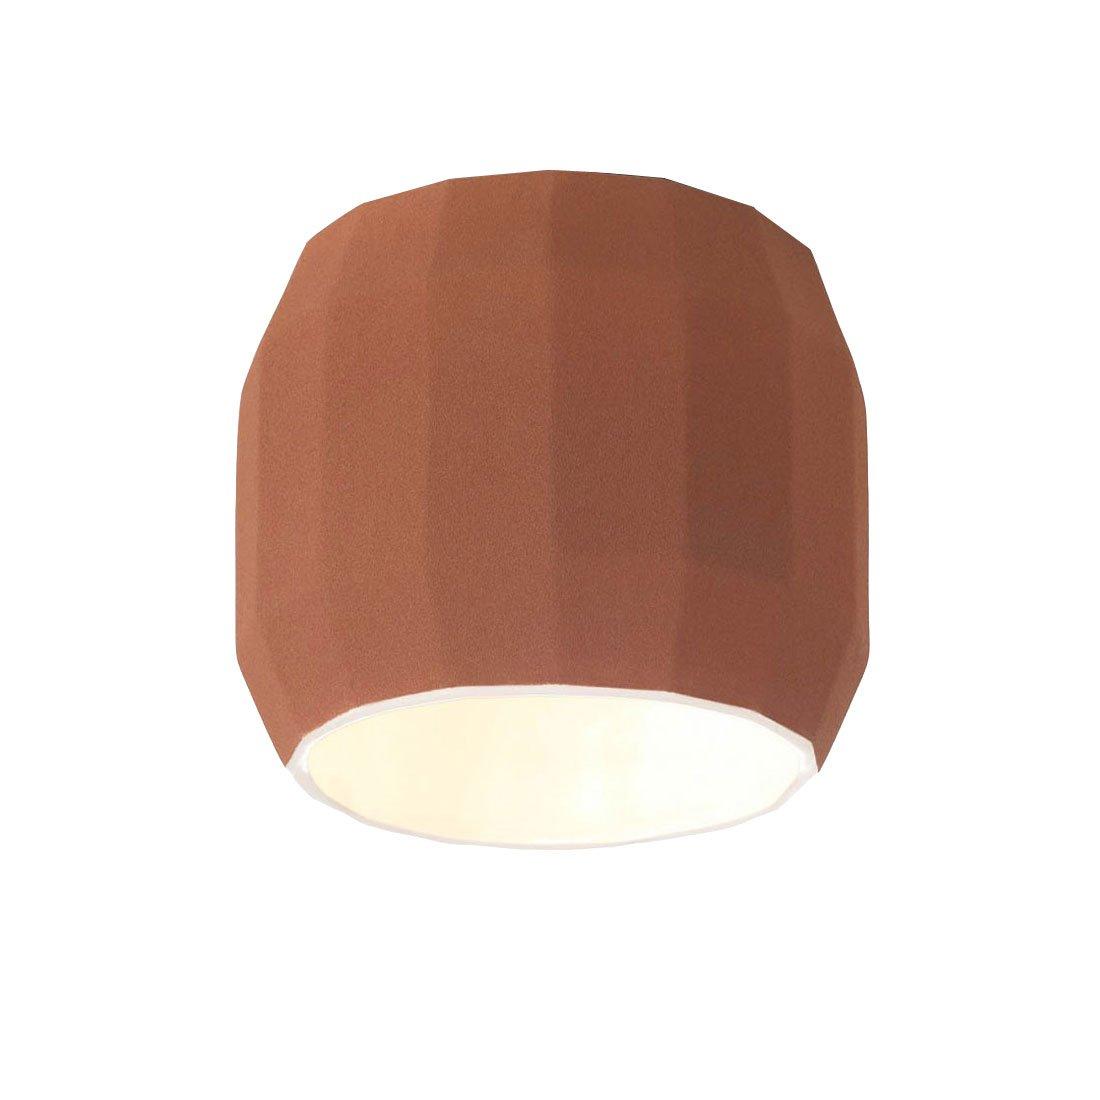 Scotch Club Plafondlamp - Marset